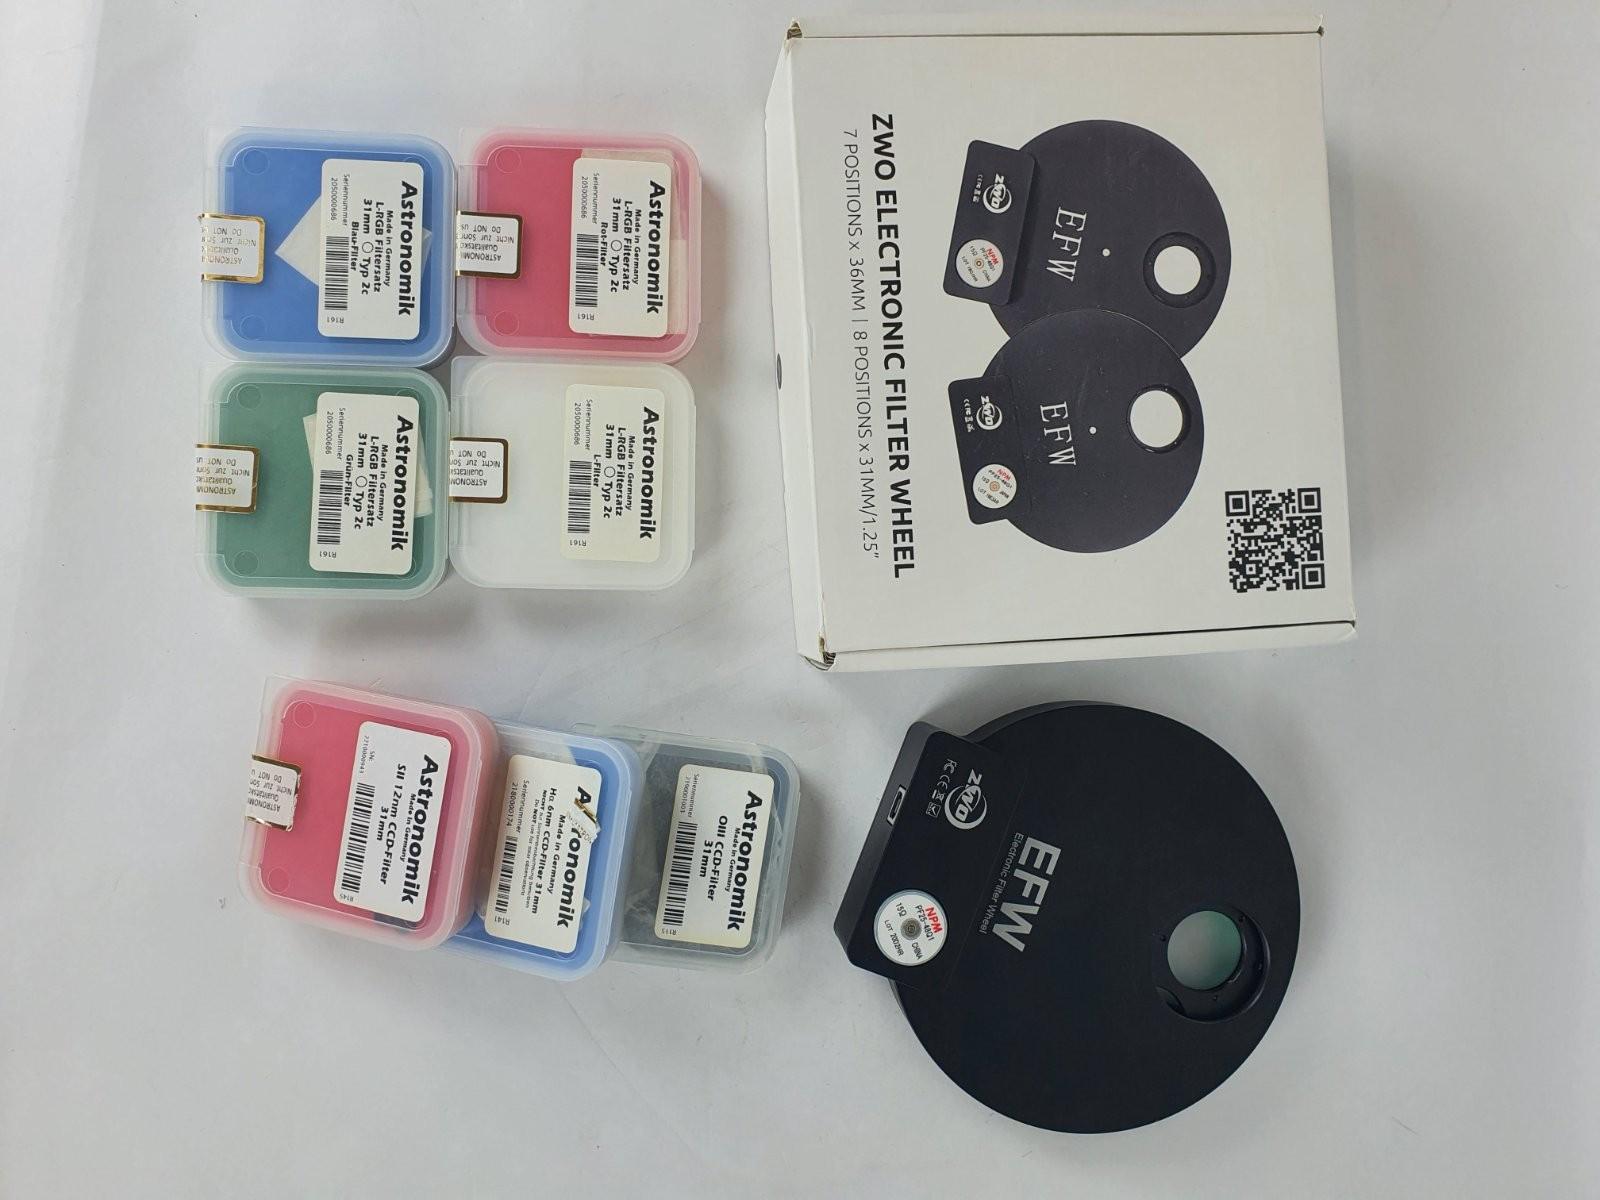 [USATO] Ruota motorizzata + set filtri 31mm LRGB HA SII OIII